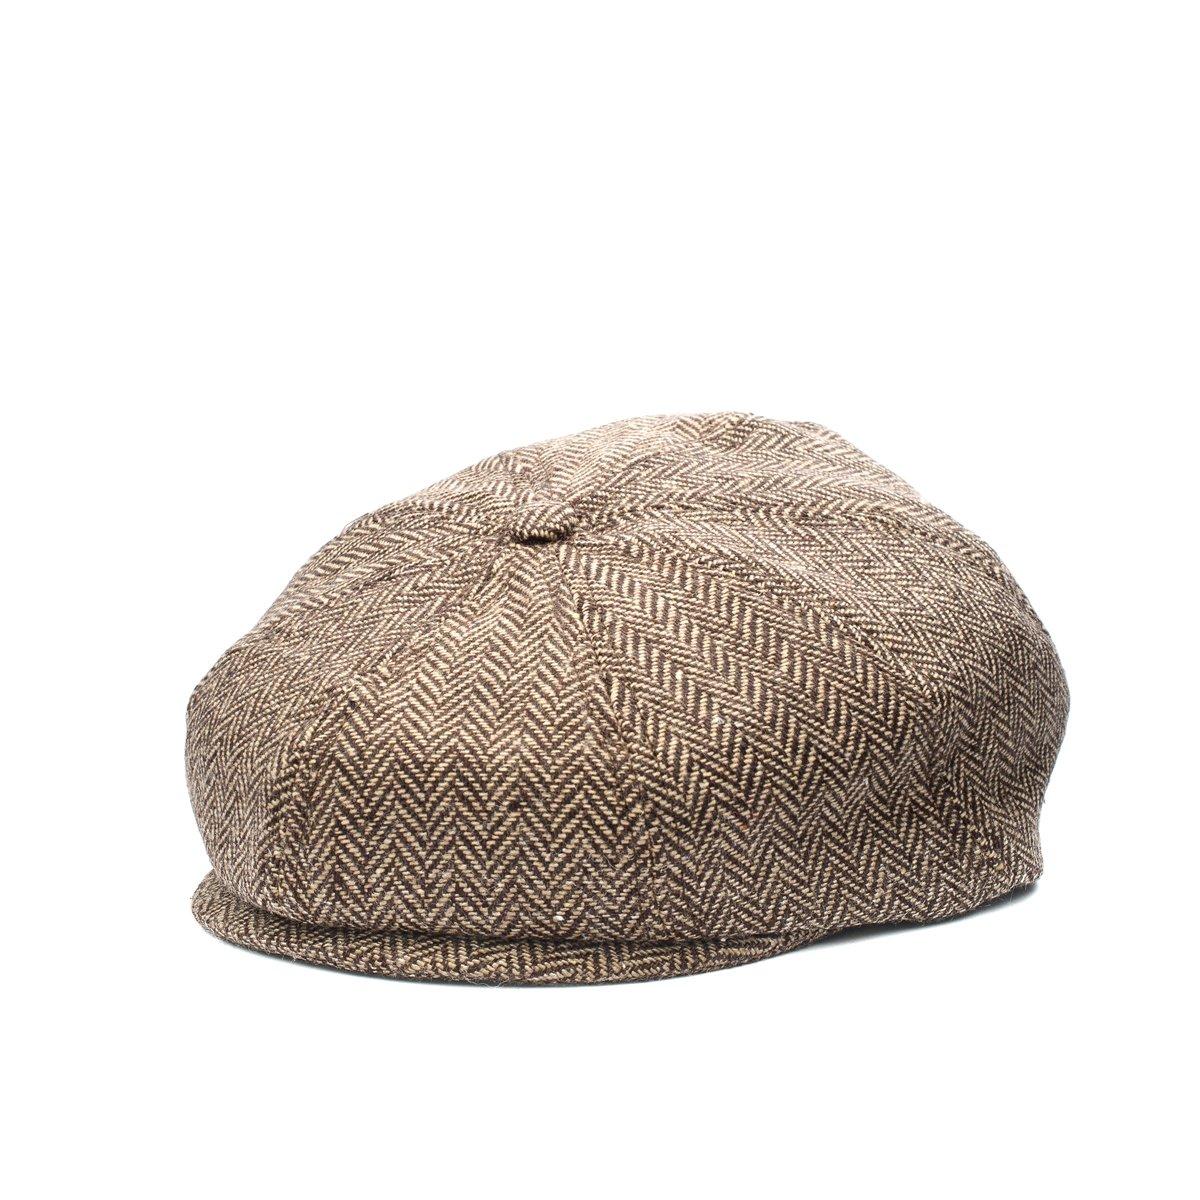 Baby Boy Scally Cap Ring Bearer Pageboy Flat Ivy Newsboy Tweed Golf Cap Hat XXS 46cm 6 to 12m, Brown